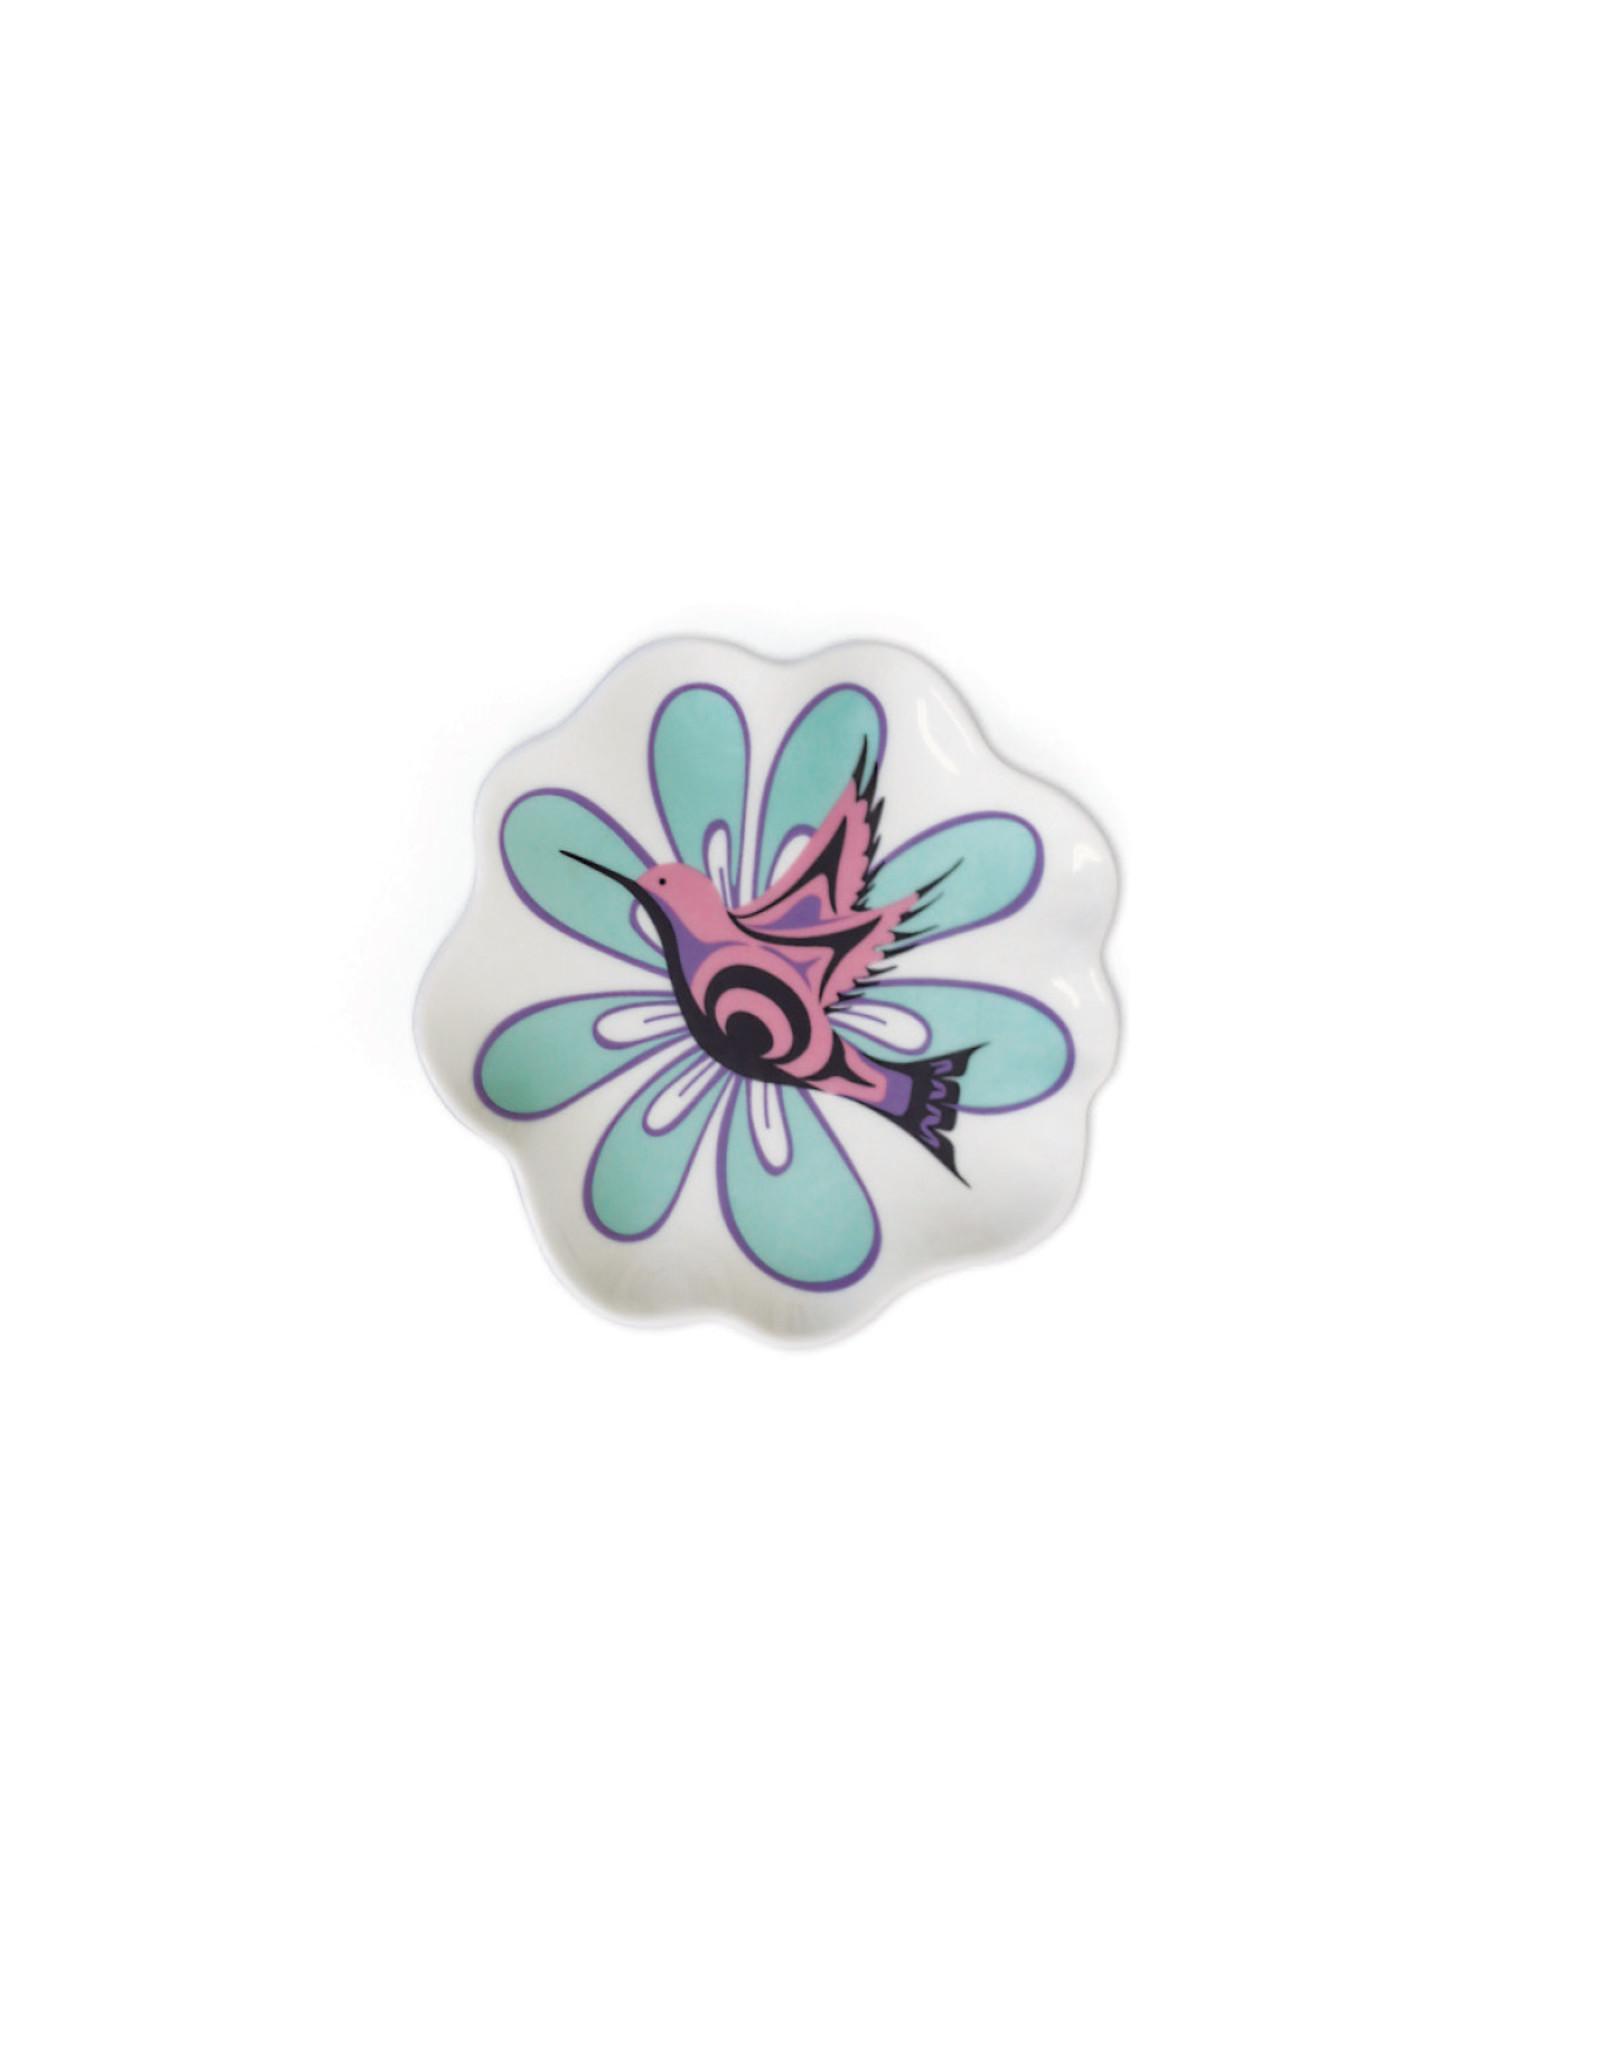 Ceramic Trinket Dish - Hummingbird by Nicole La Rock (TDISH13)